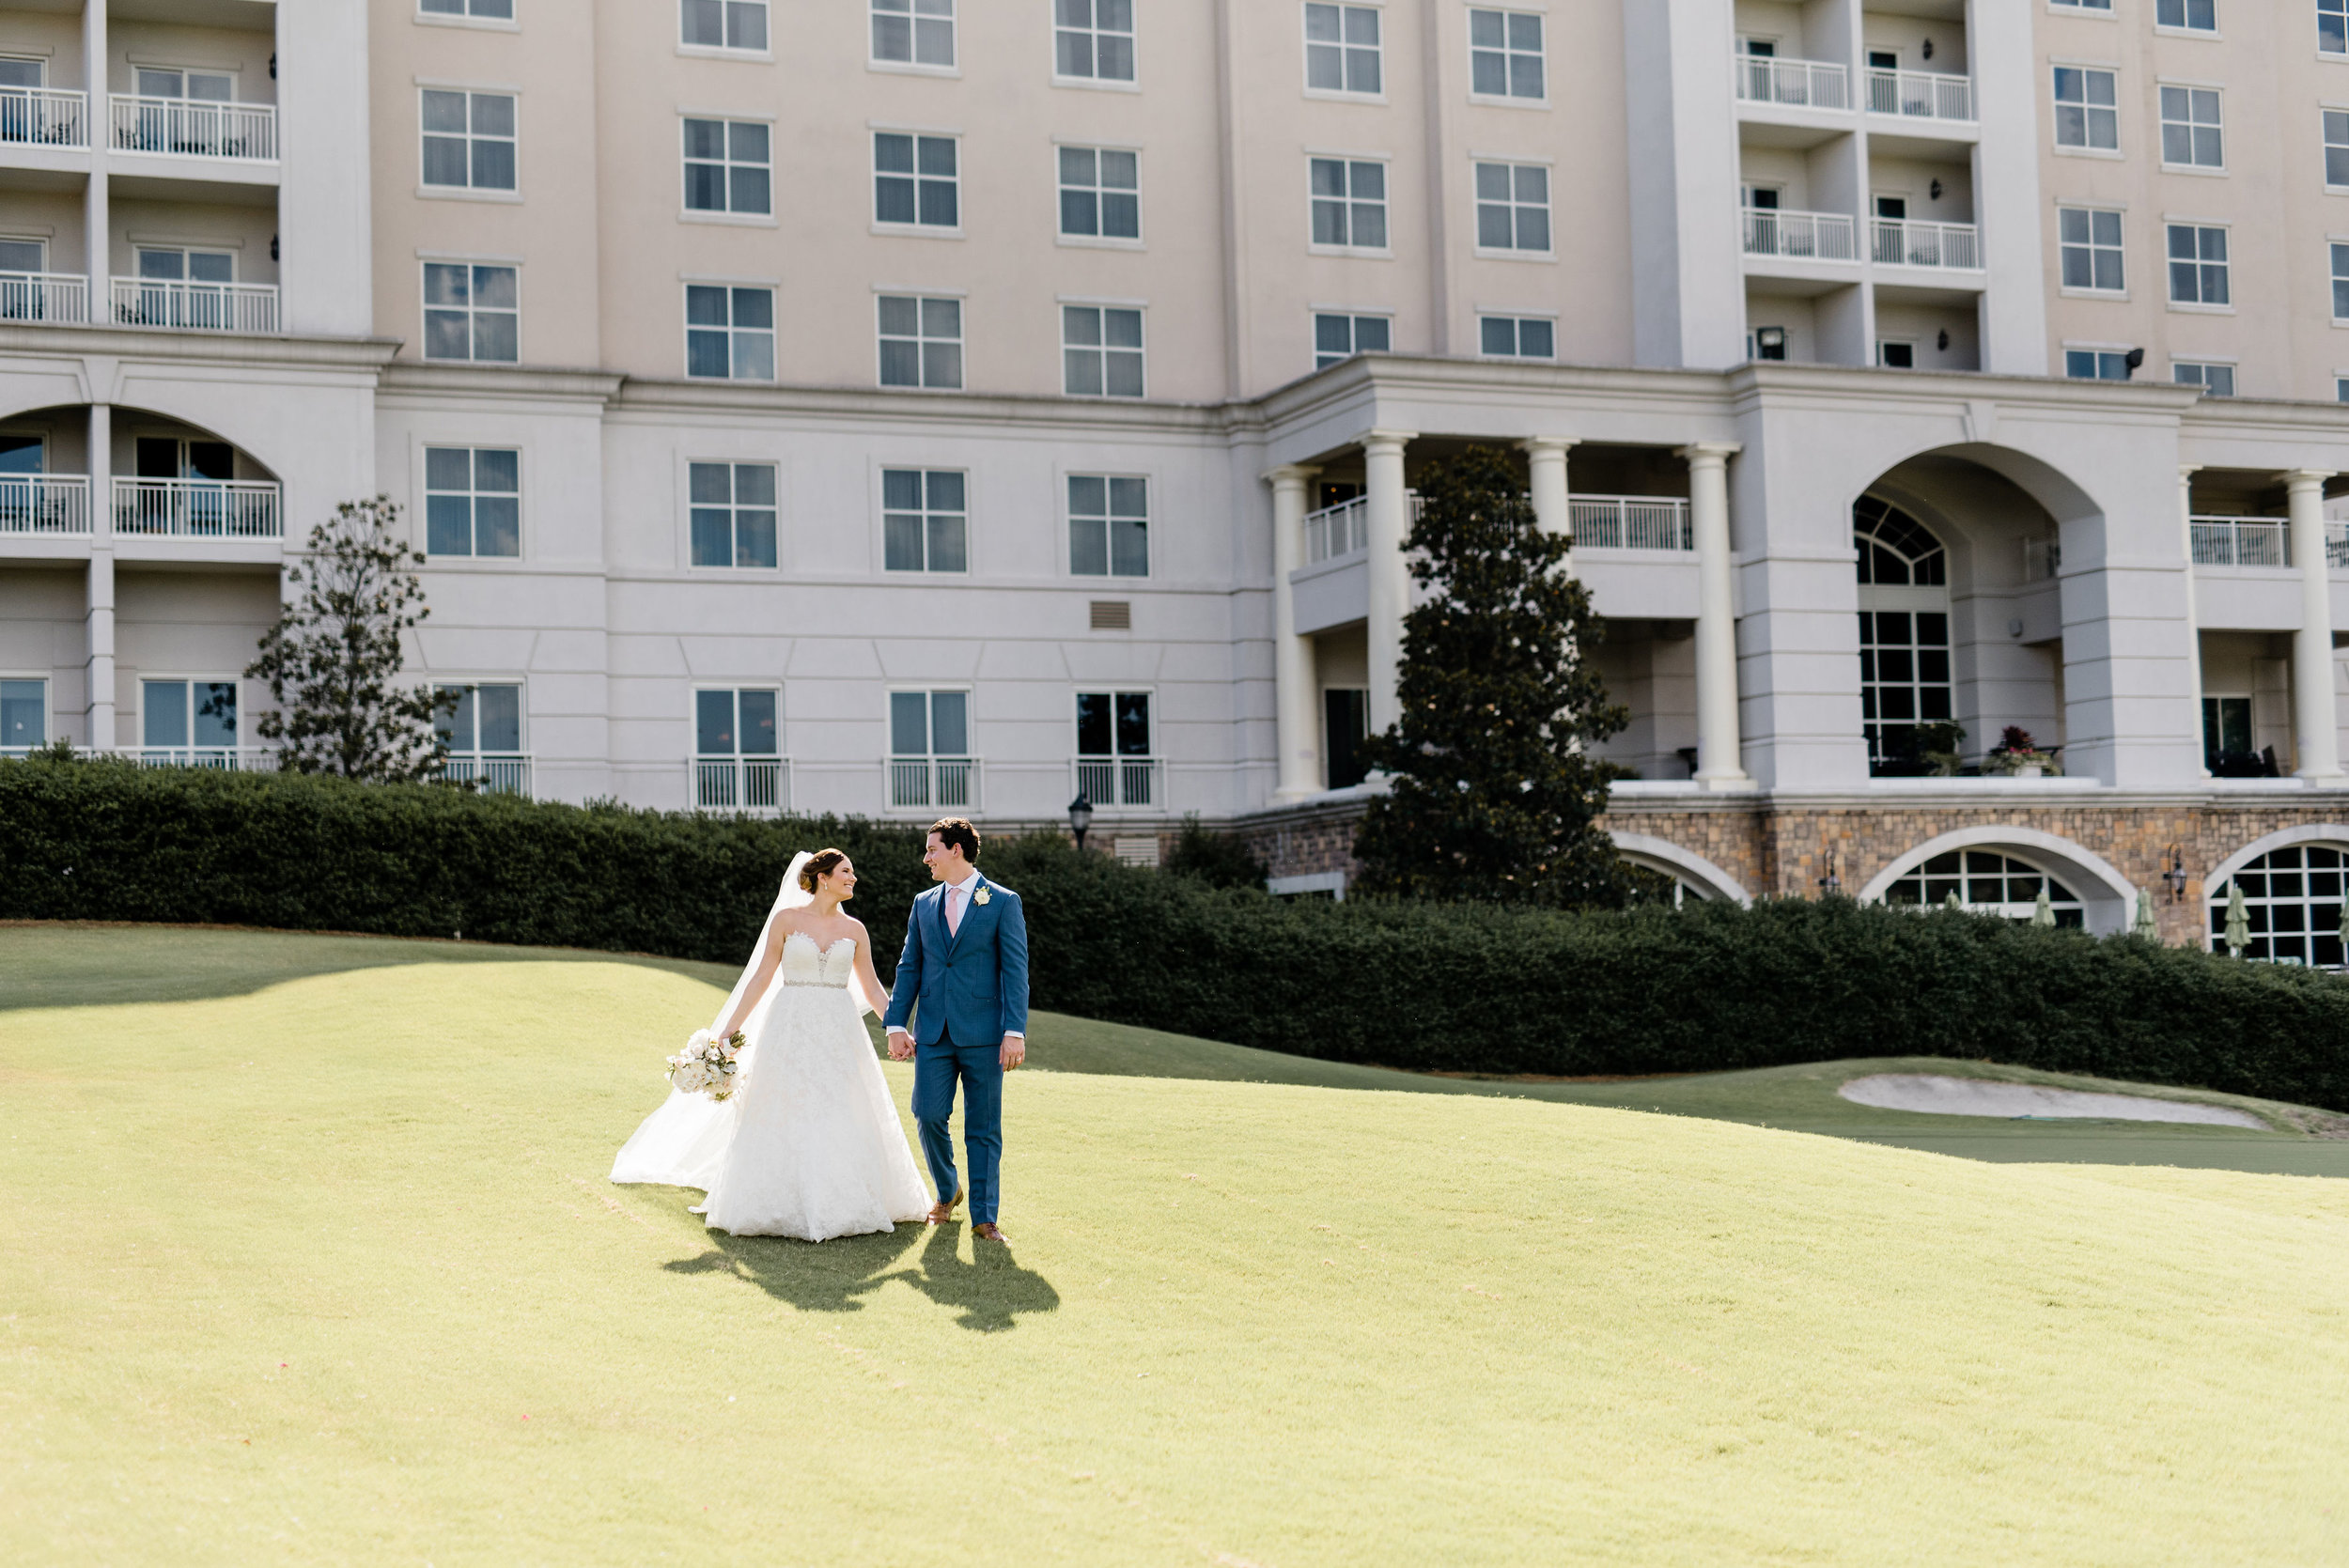 McElravey_Wedding_CarolineLimaPhotography_2018_234.jpg